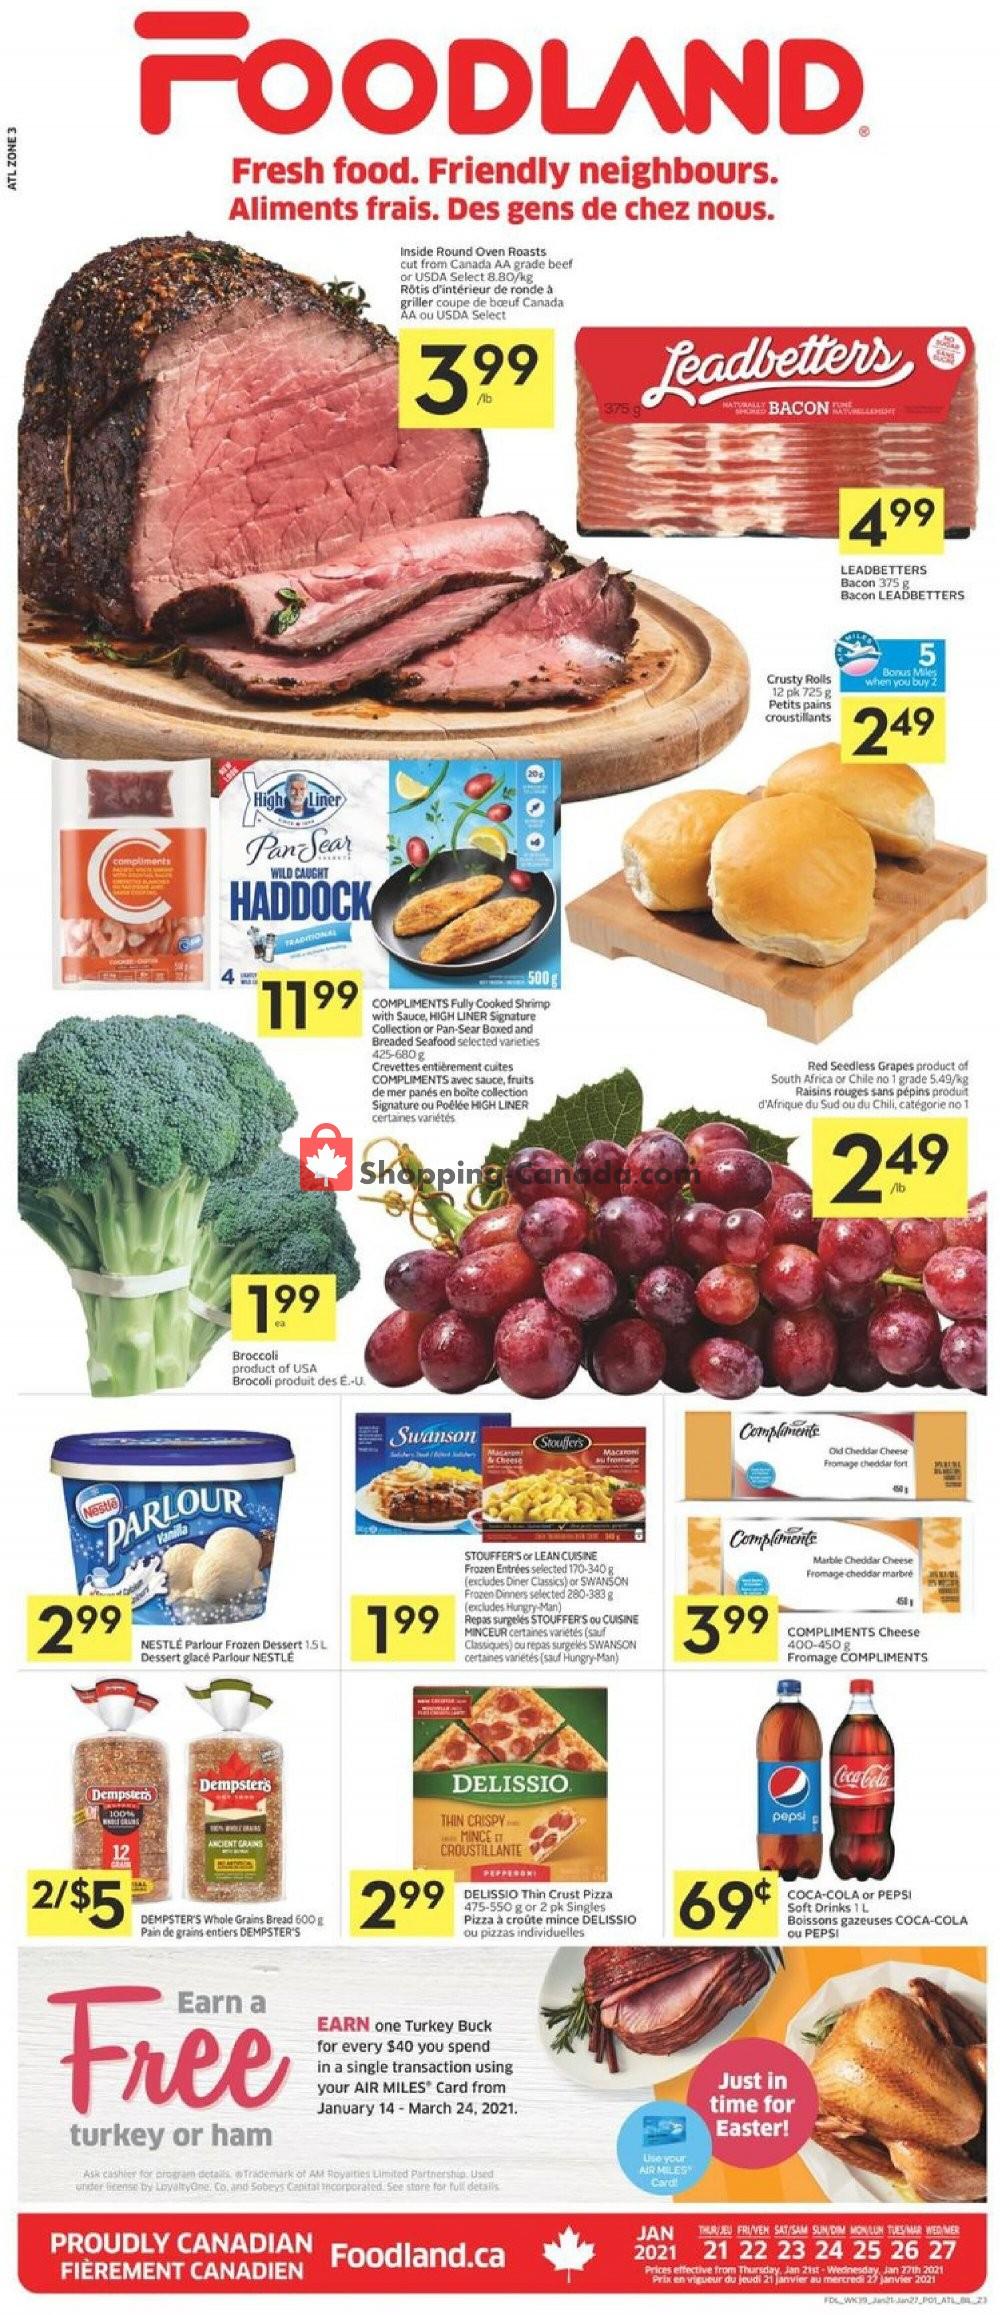 Flyer Foodland Canada - from Thursday January 21, 2021 to Wednesday January 27, 2021